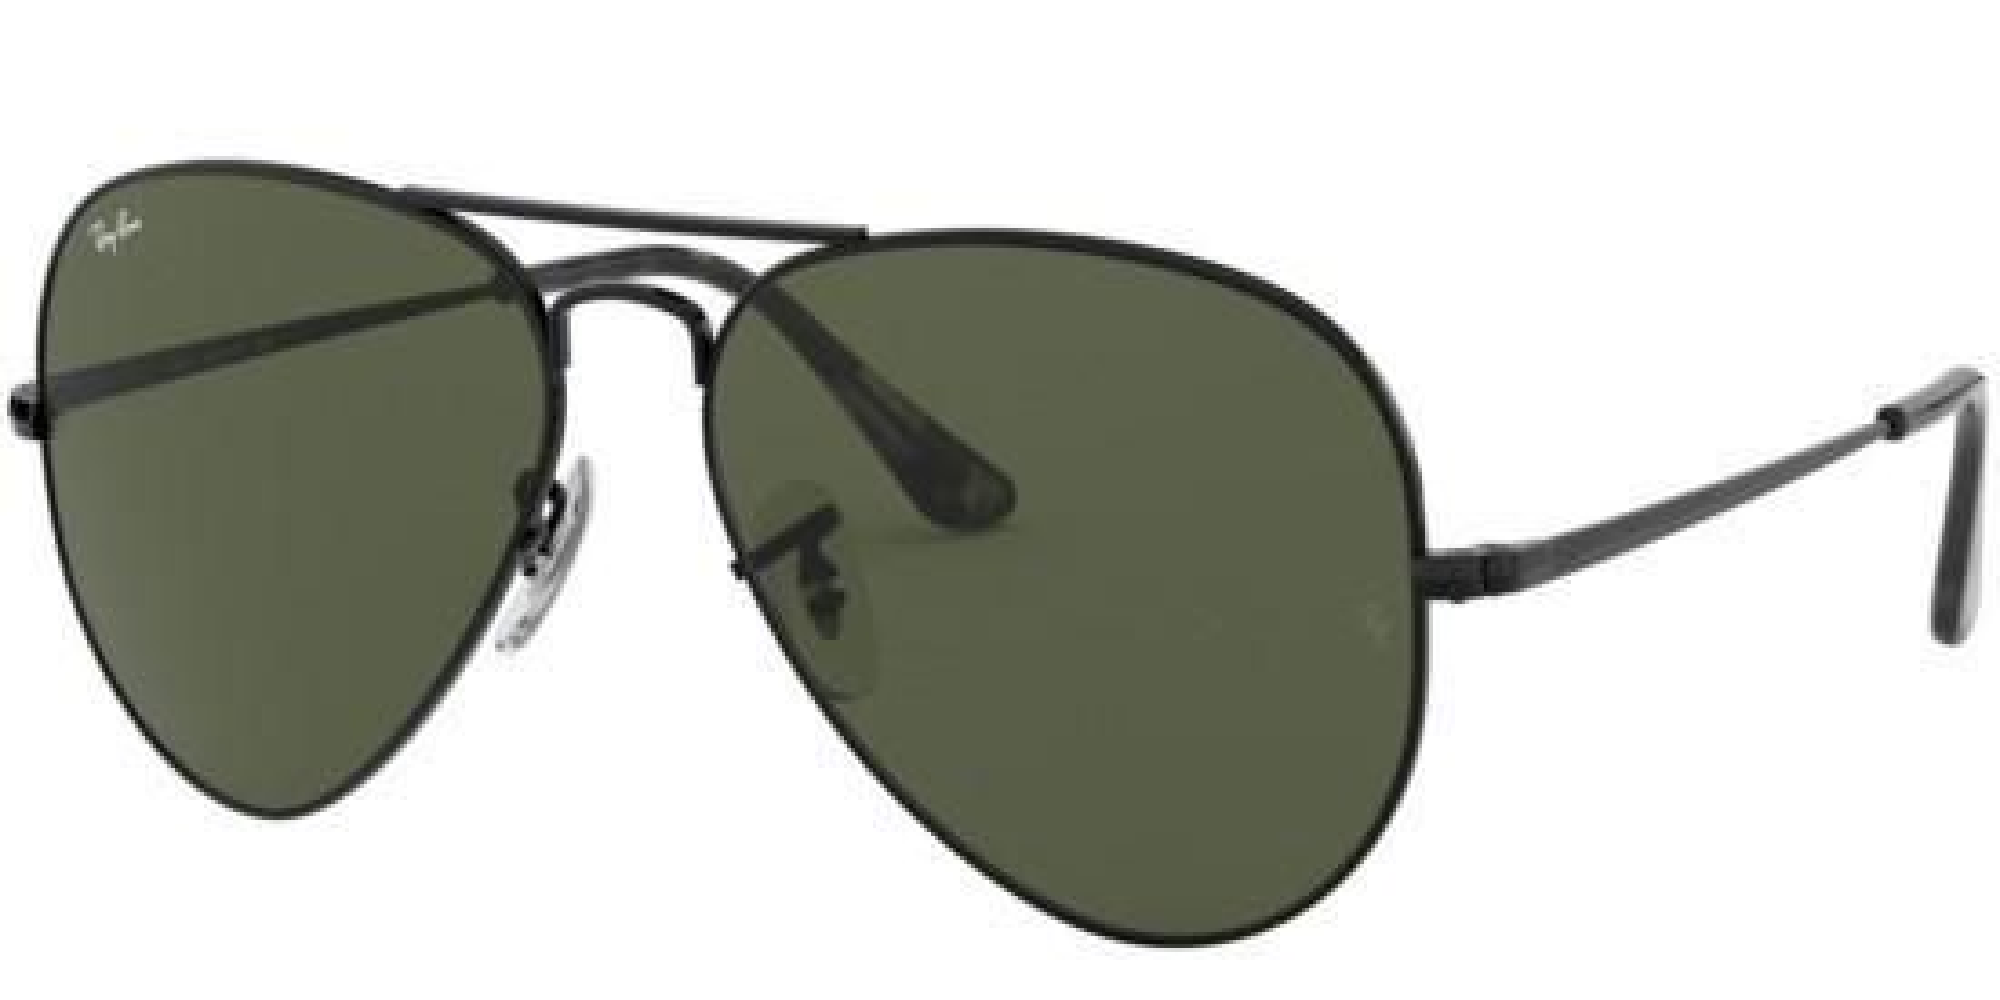 CARRERA SOLE CARRERA 5043S 900 56 Hombre, Mujer Gafas